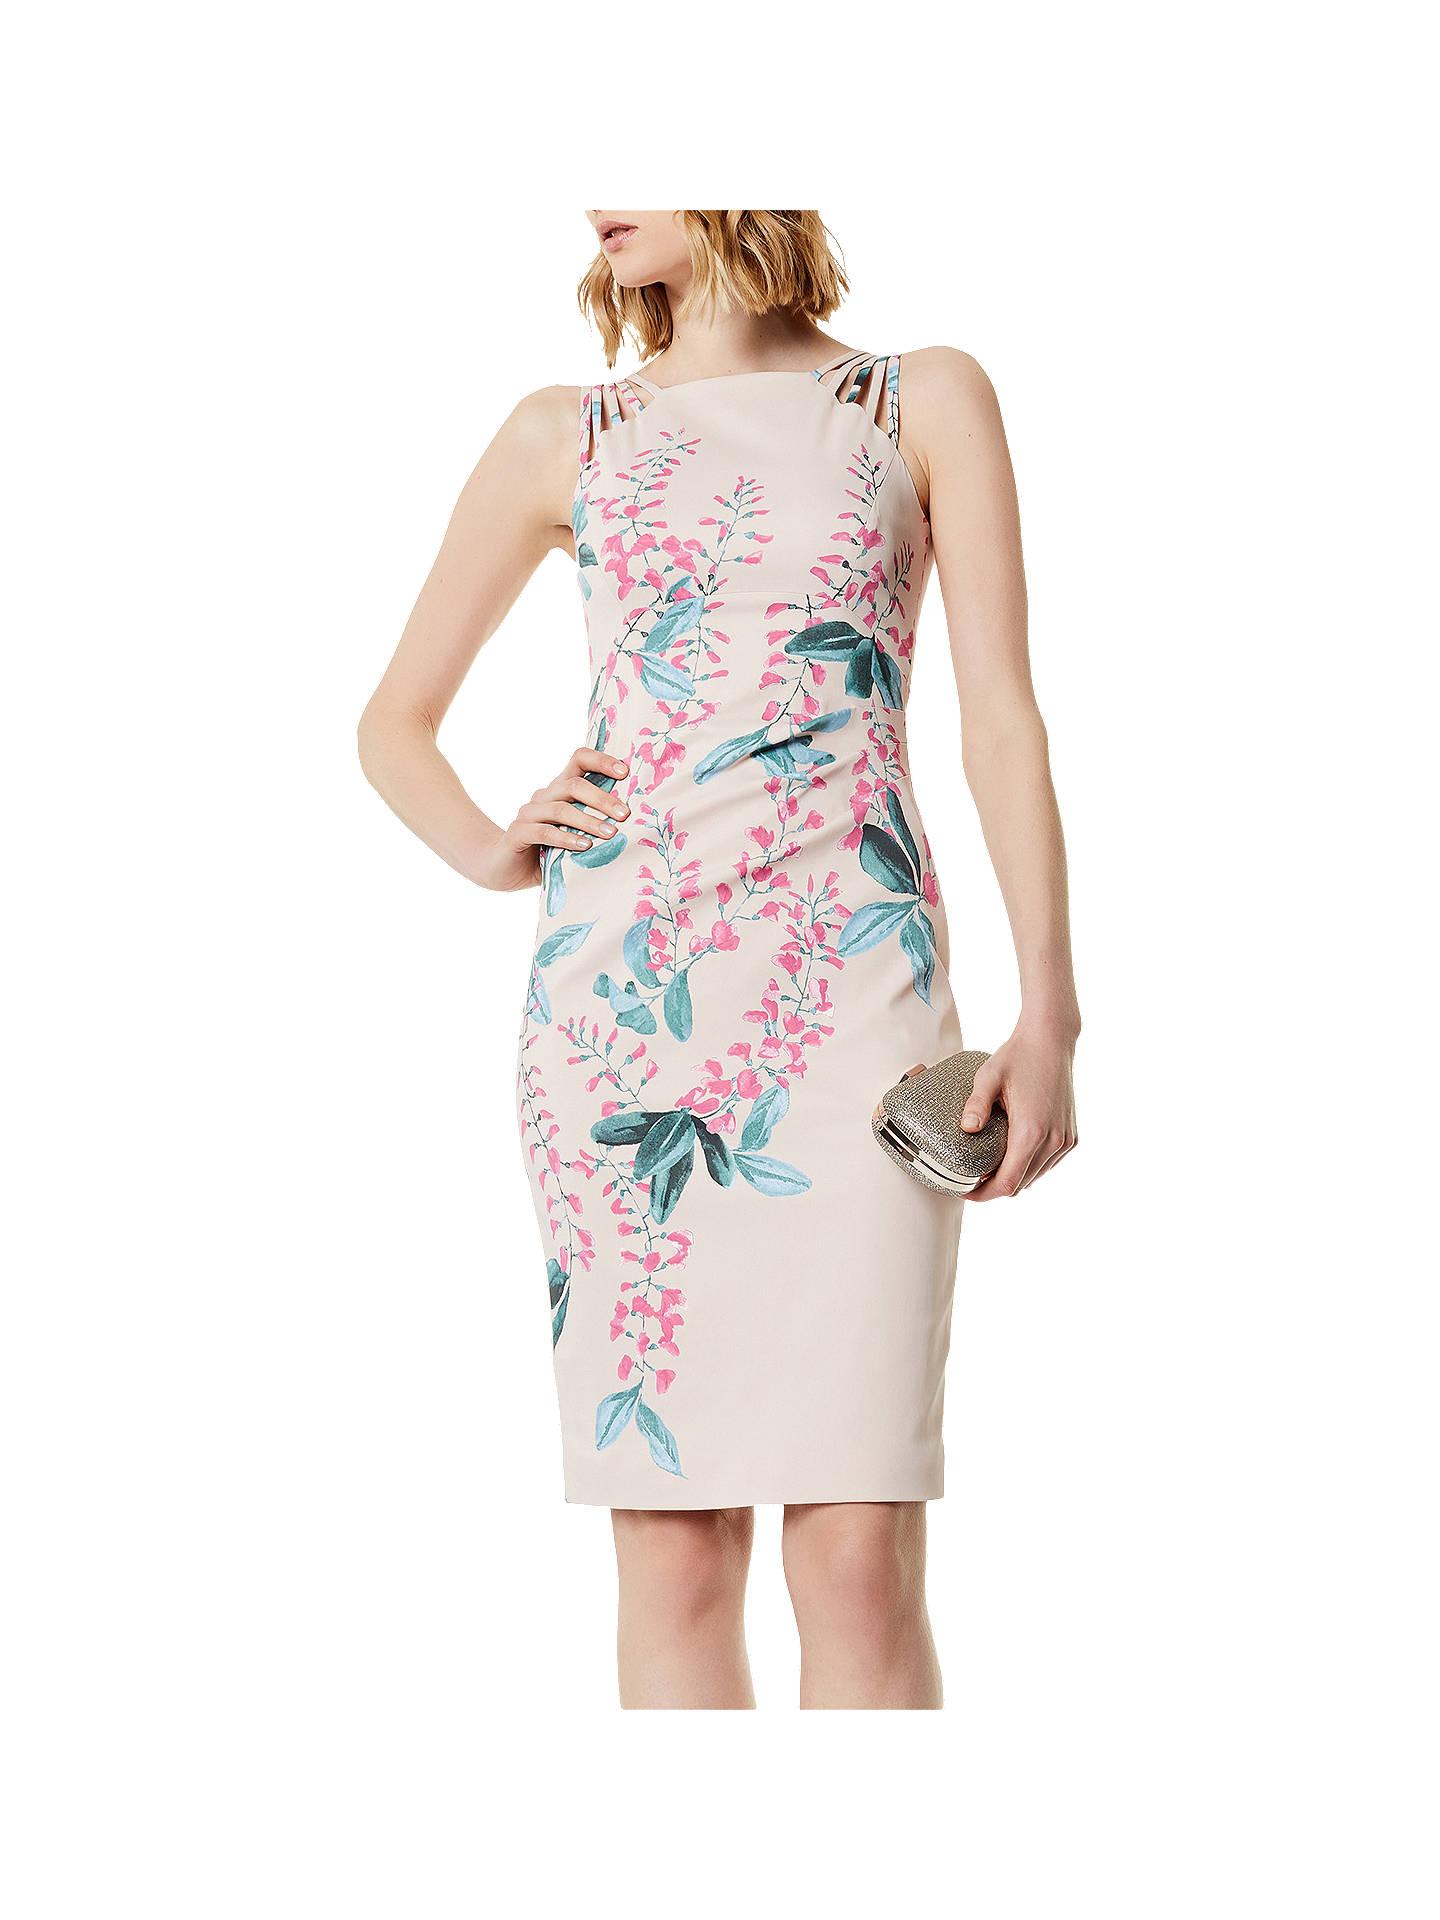 15df6f33ed Buy Karen Millen Wisteria Floral Print Signature Dress